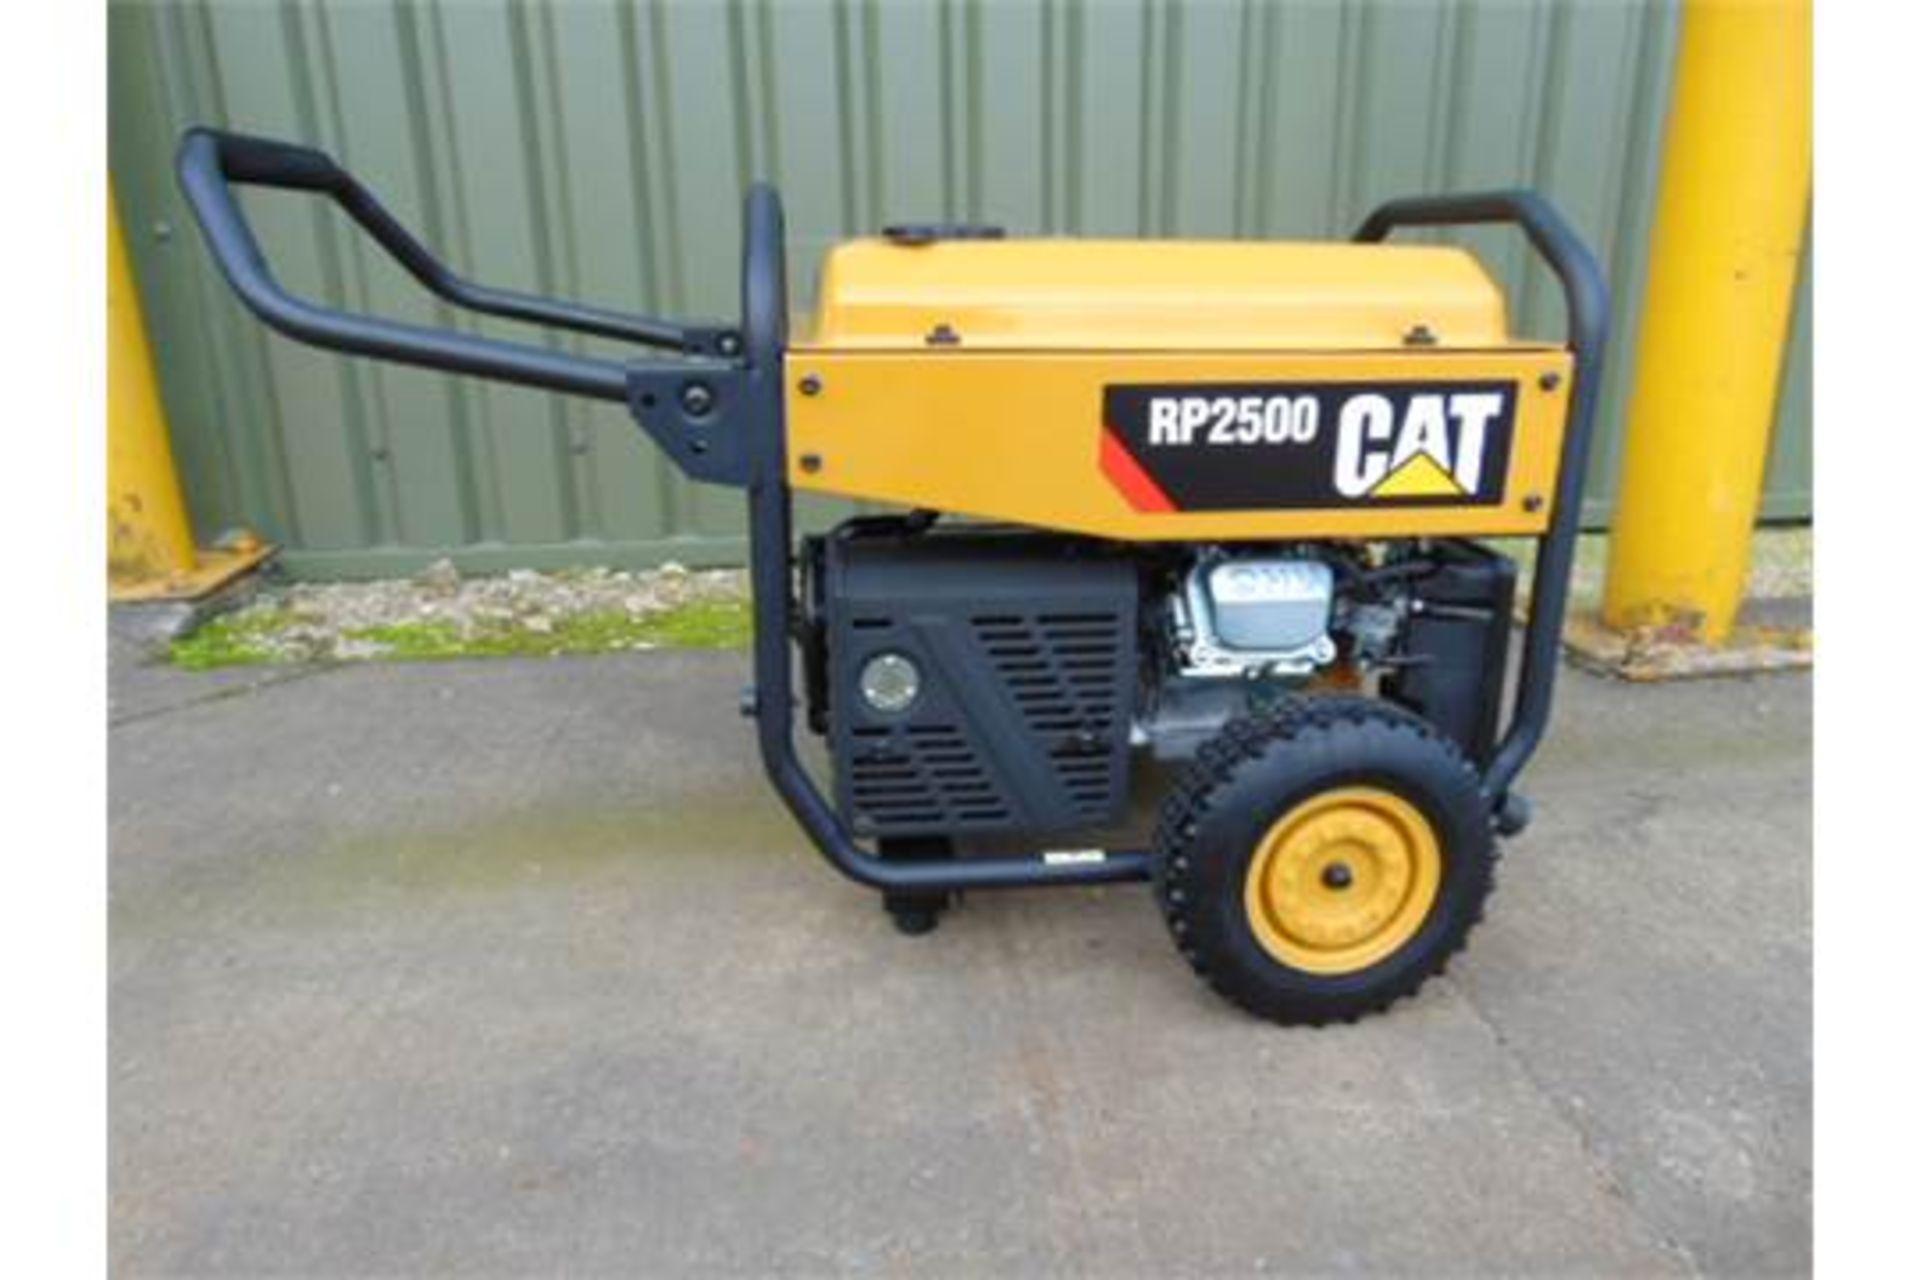 Lot 34 - UNISSUED Caterpillar RP2500 Industrial Petrol Generator Set